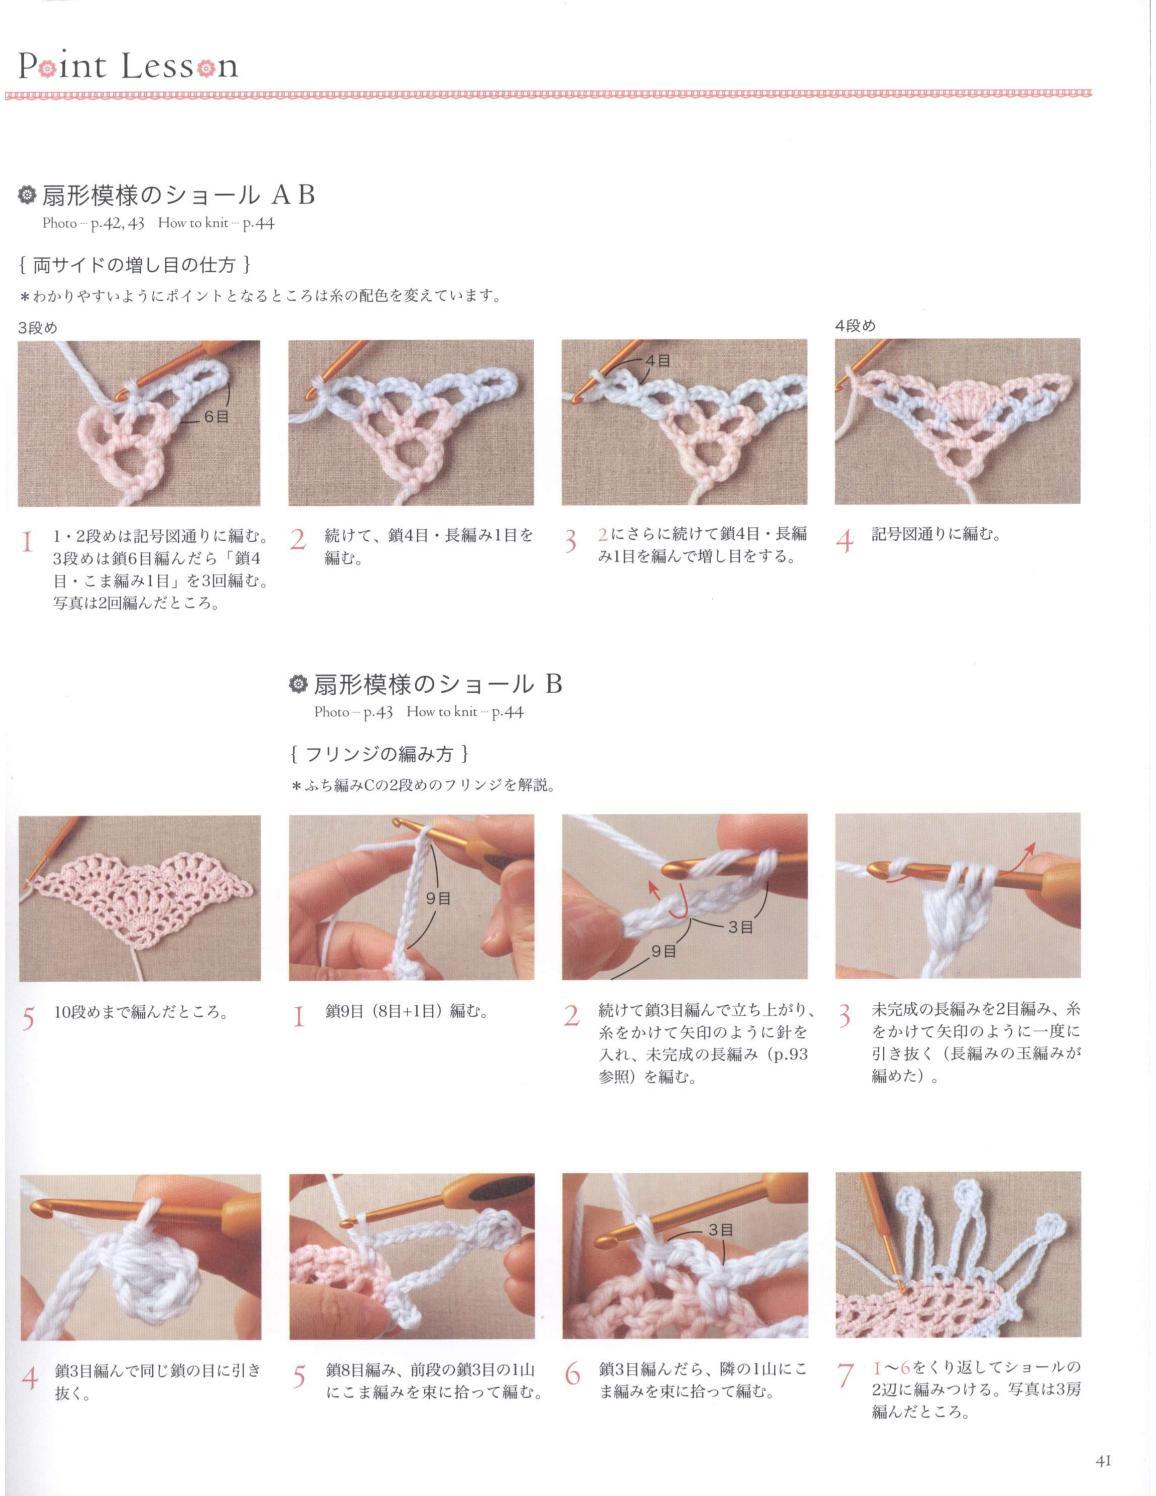 Asahi original crochet best selection 2012 page 41